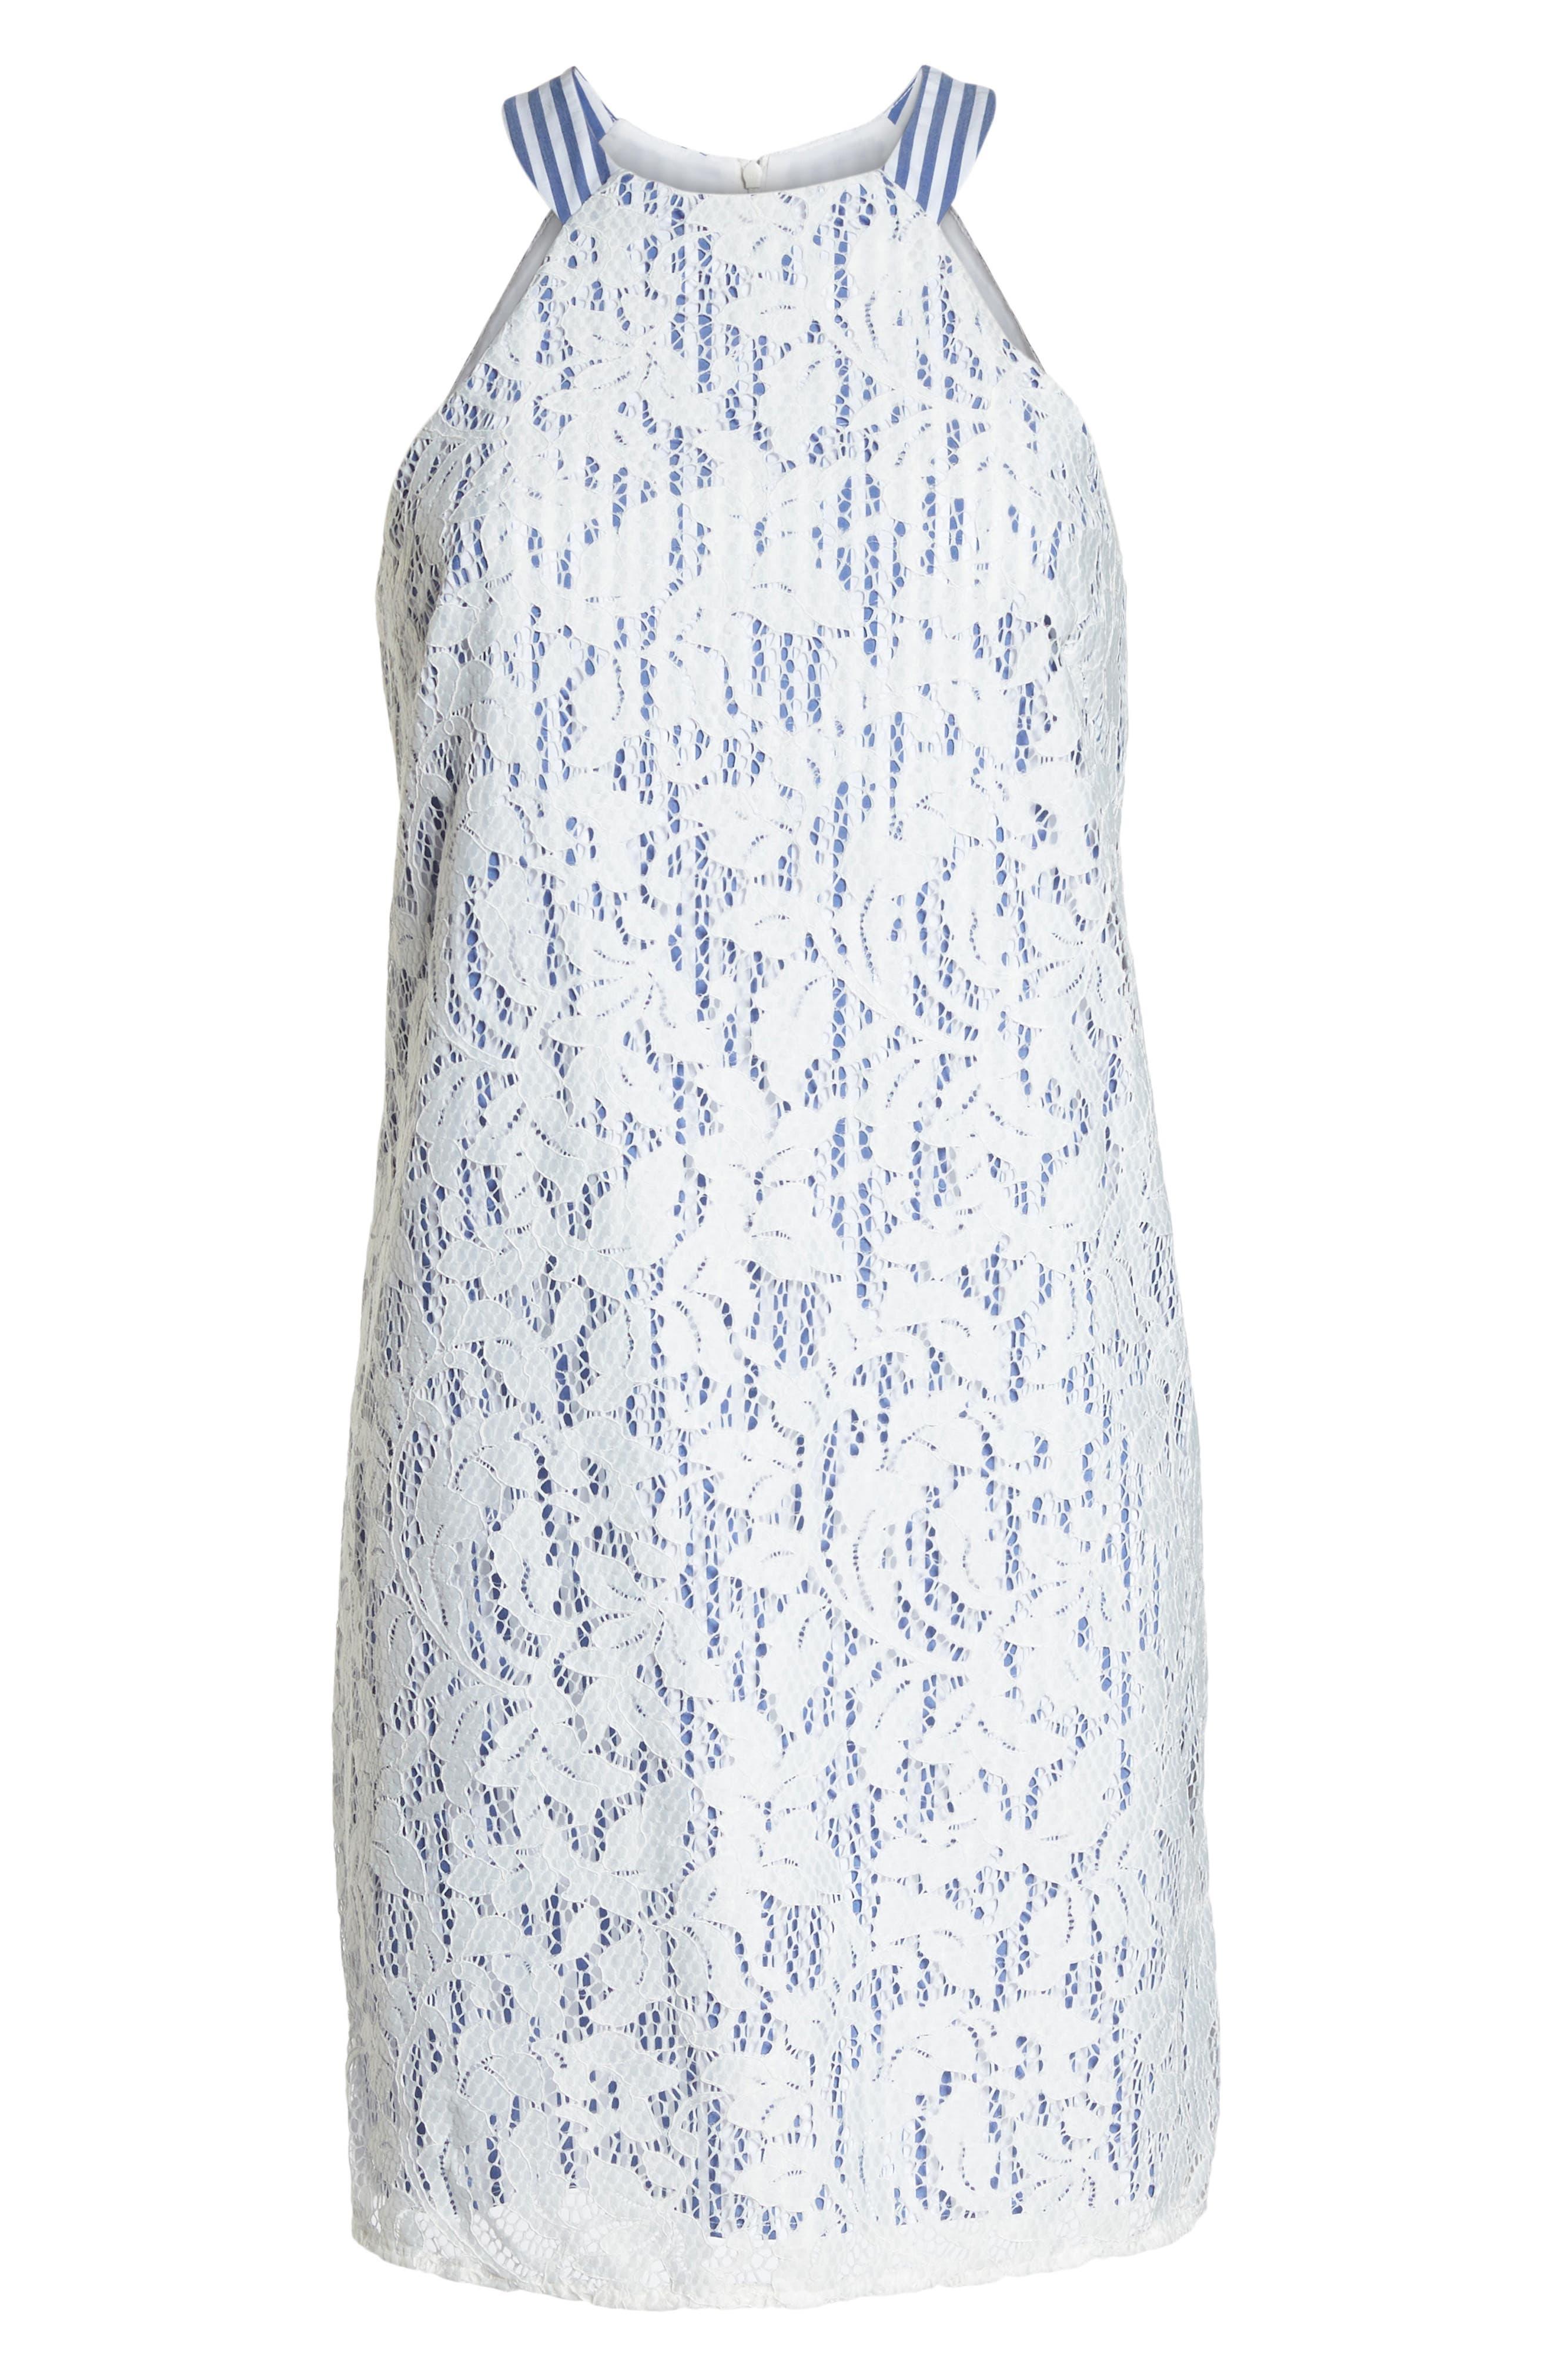 Pinstripe Lace Overlay Shift Dress,                             Alternate thumbnail 7, color,                             WHITE/ BLUE